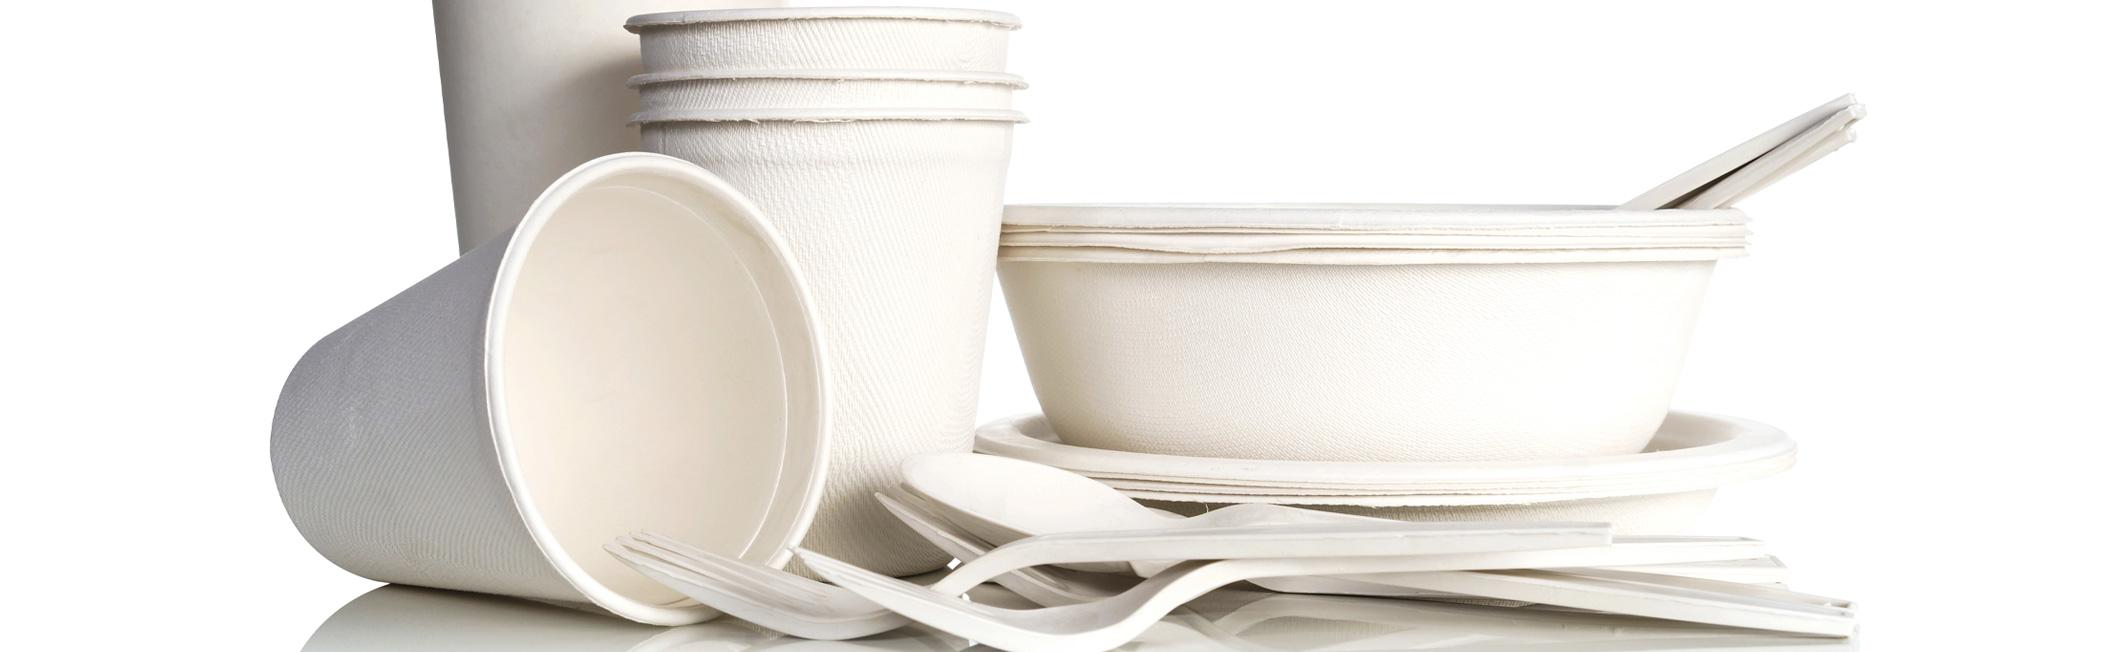 0996935a9ebe Disposable Kitchenware - Gordon Food Service Store